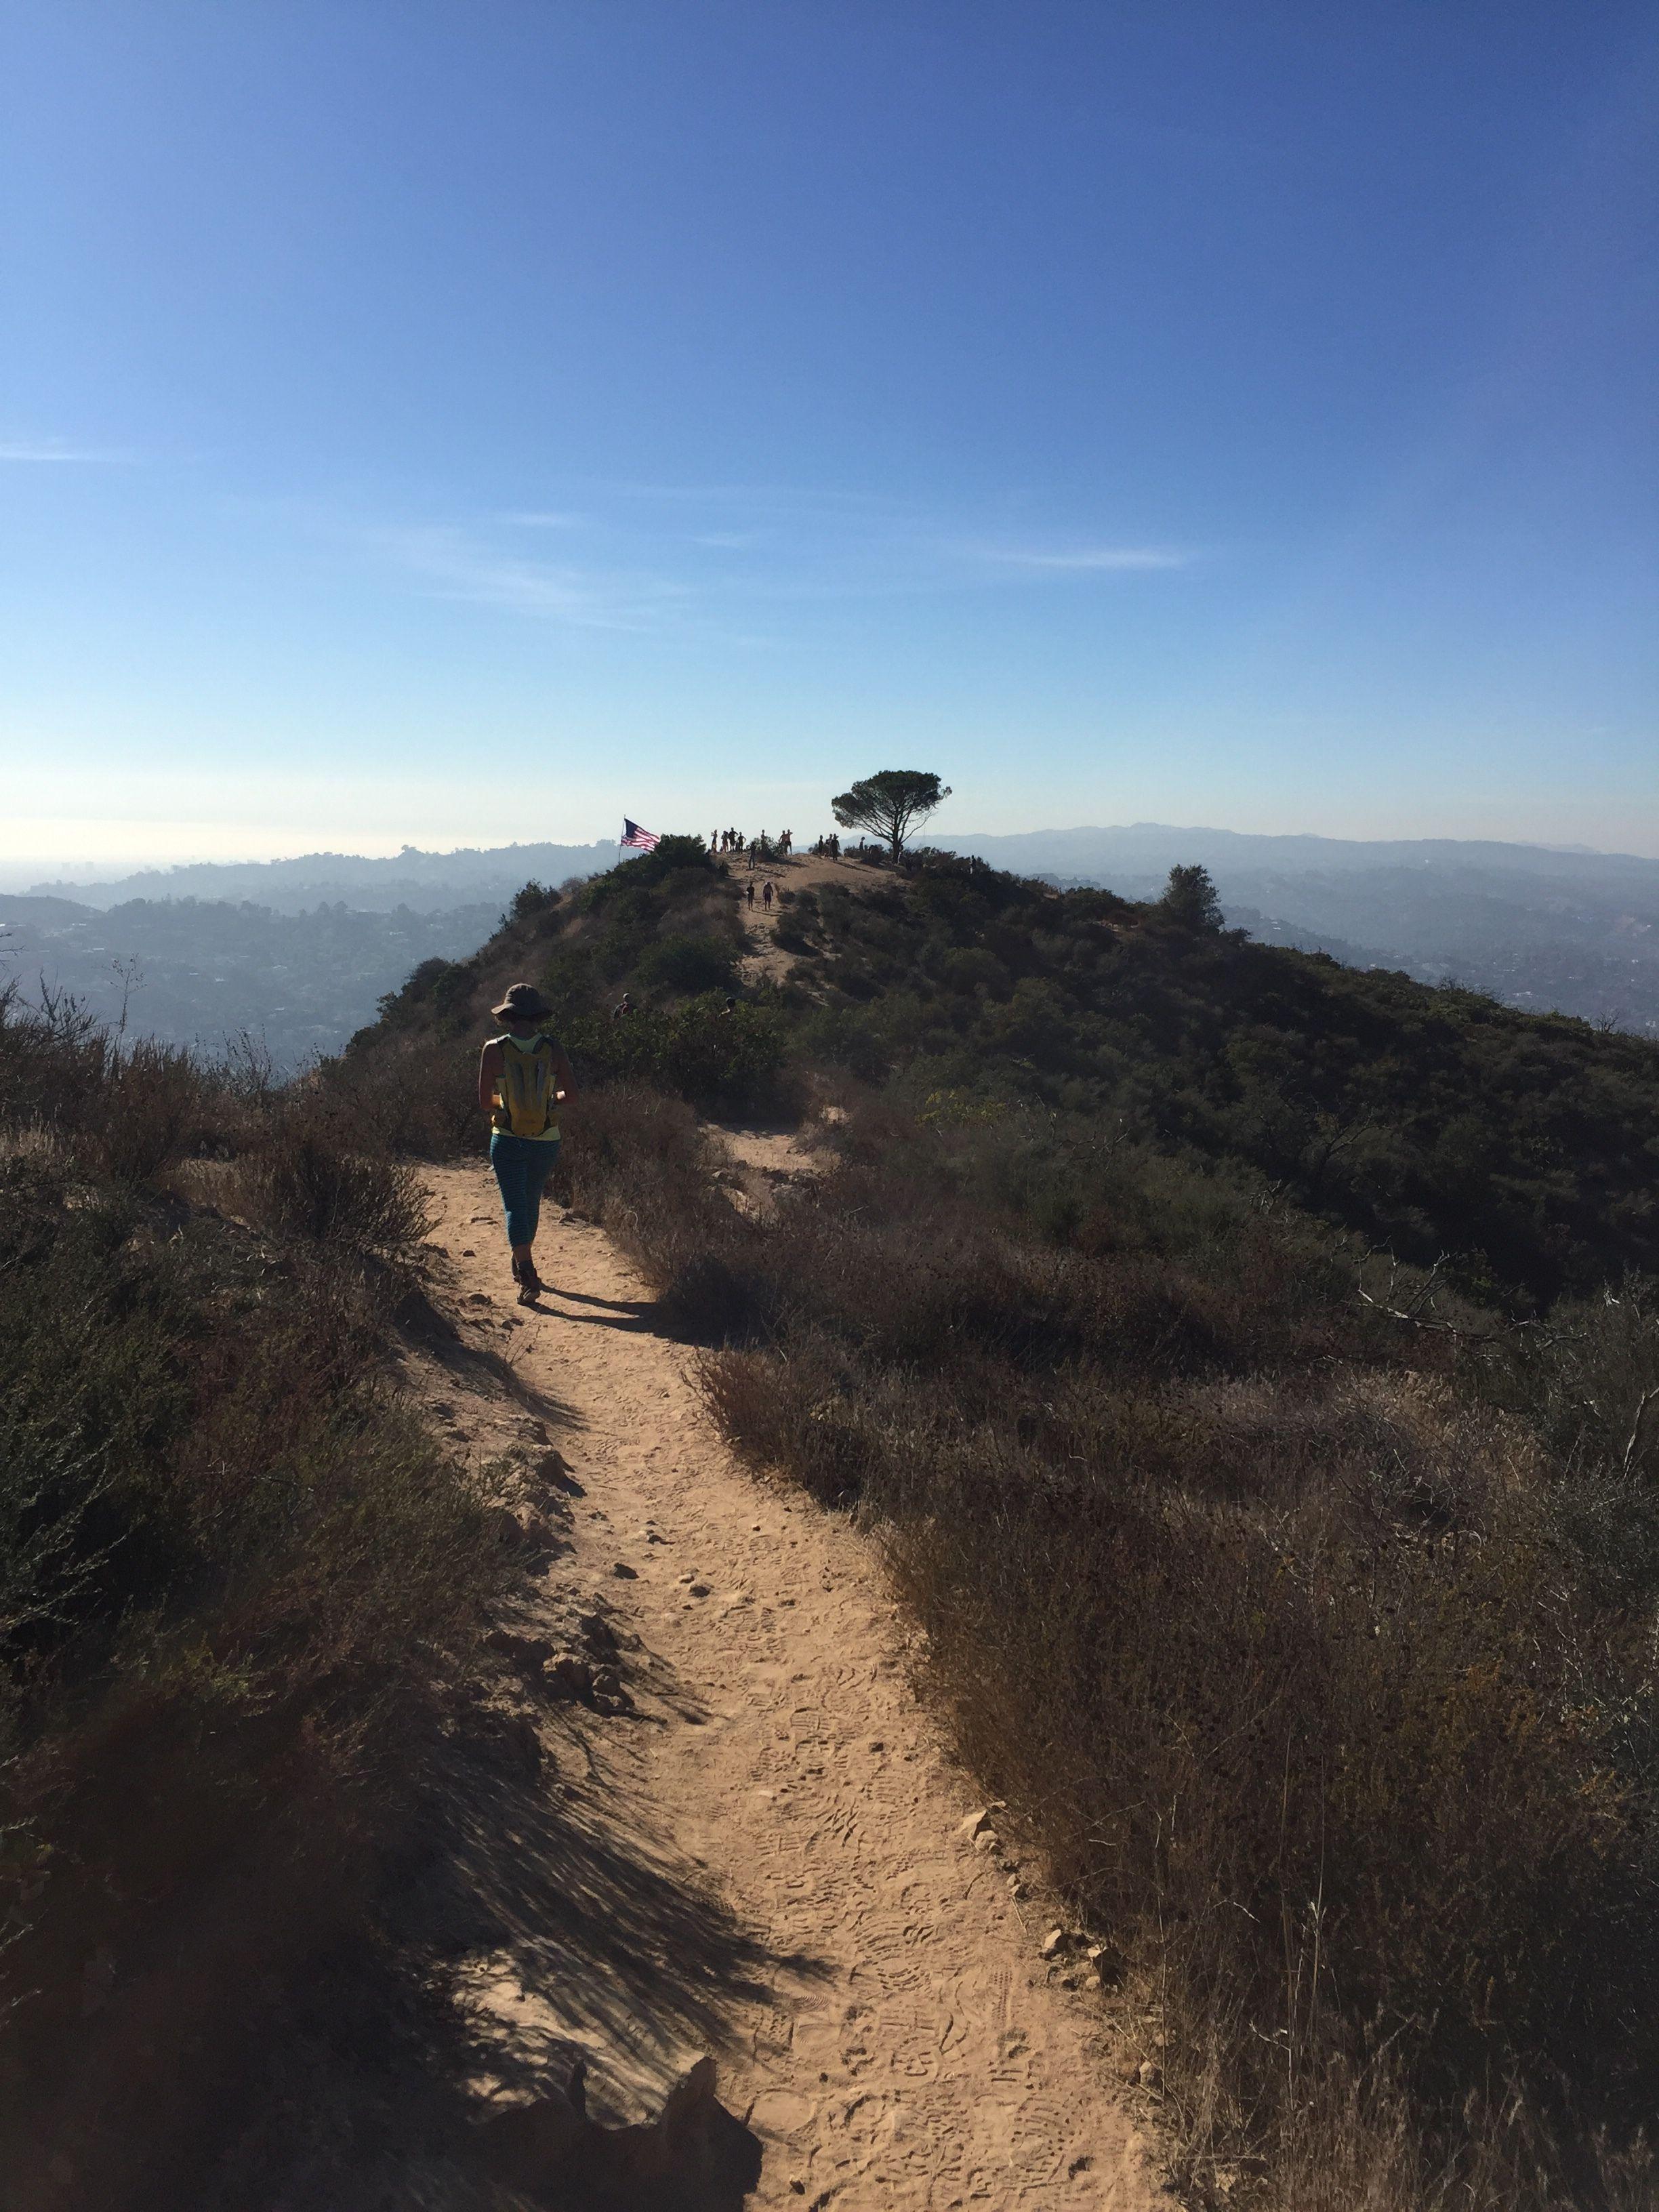 Los Angeles Hiking Group